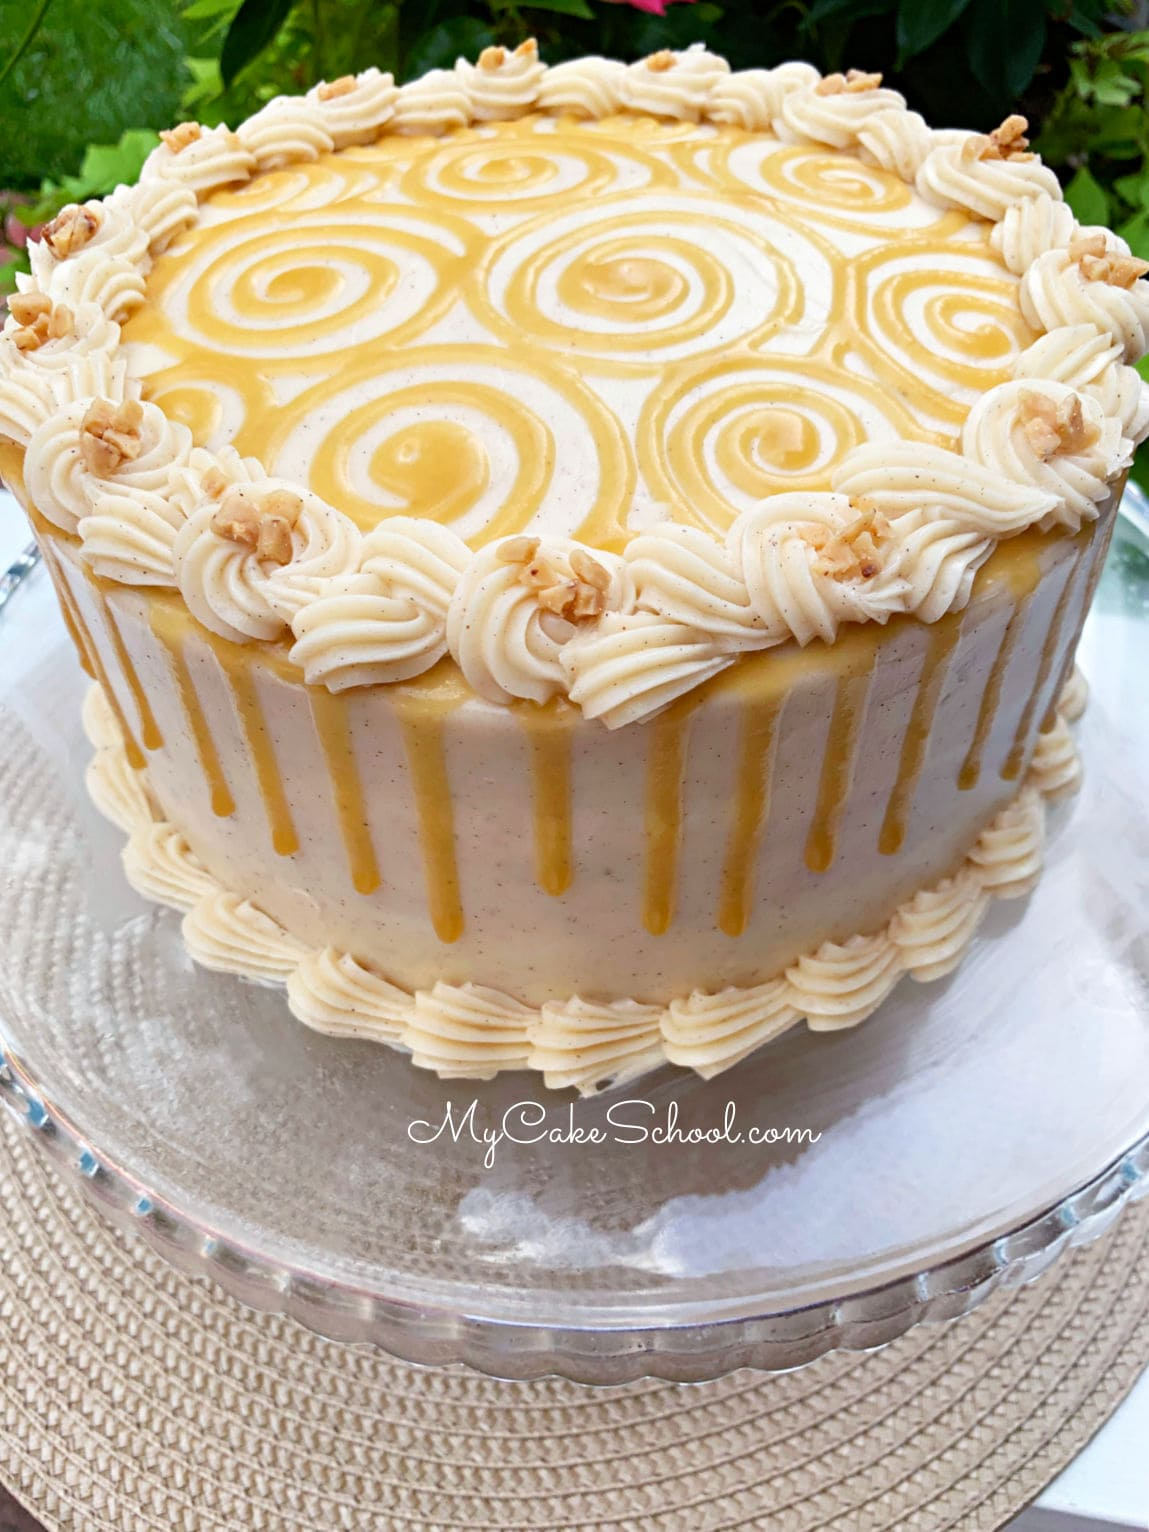 Toffee Apple Caramel Cake